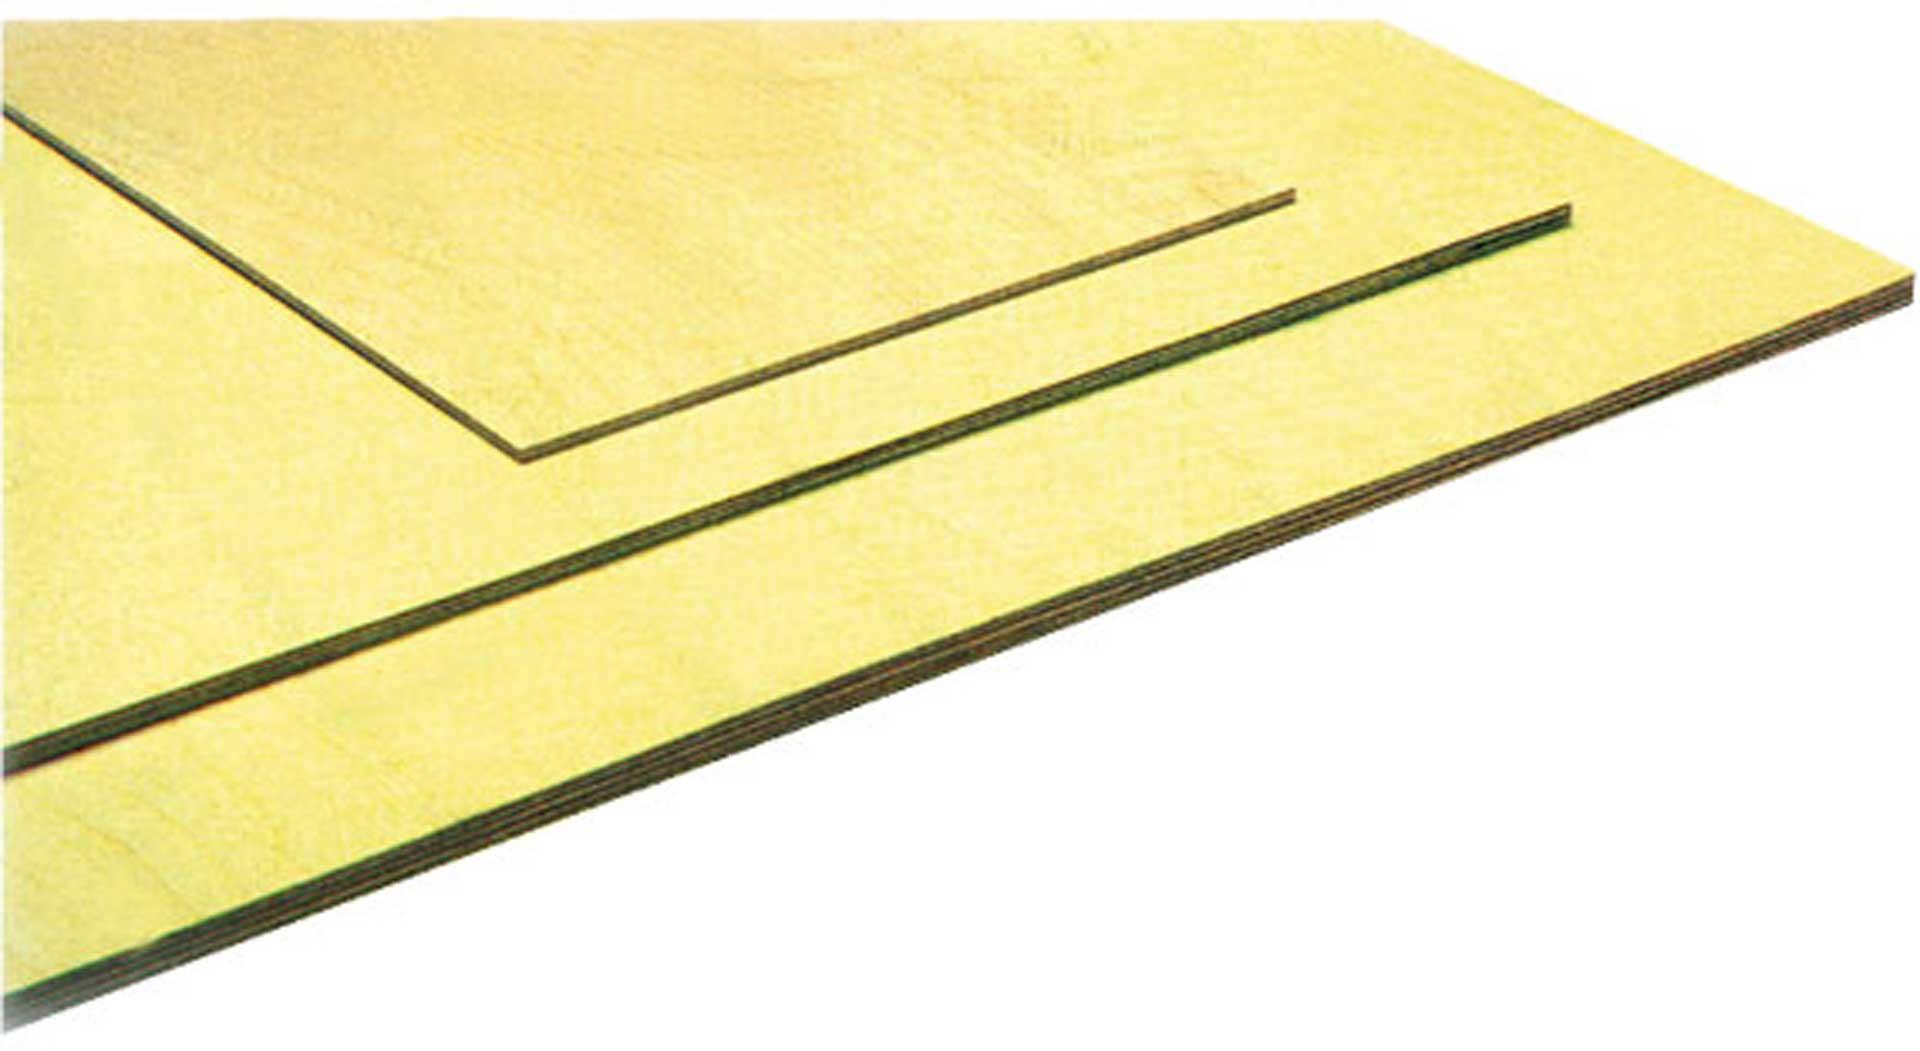 MODELLBAU LINDINGER BIRCH-WOOD 1,0/300/500MM